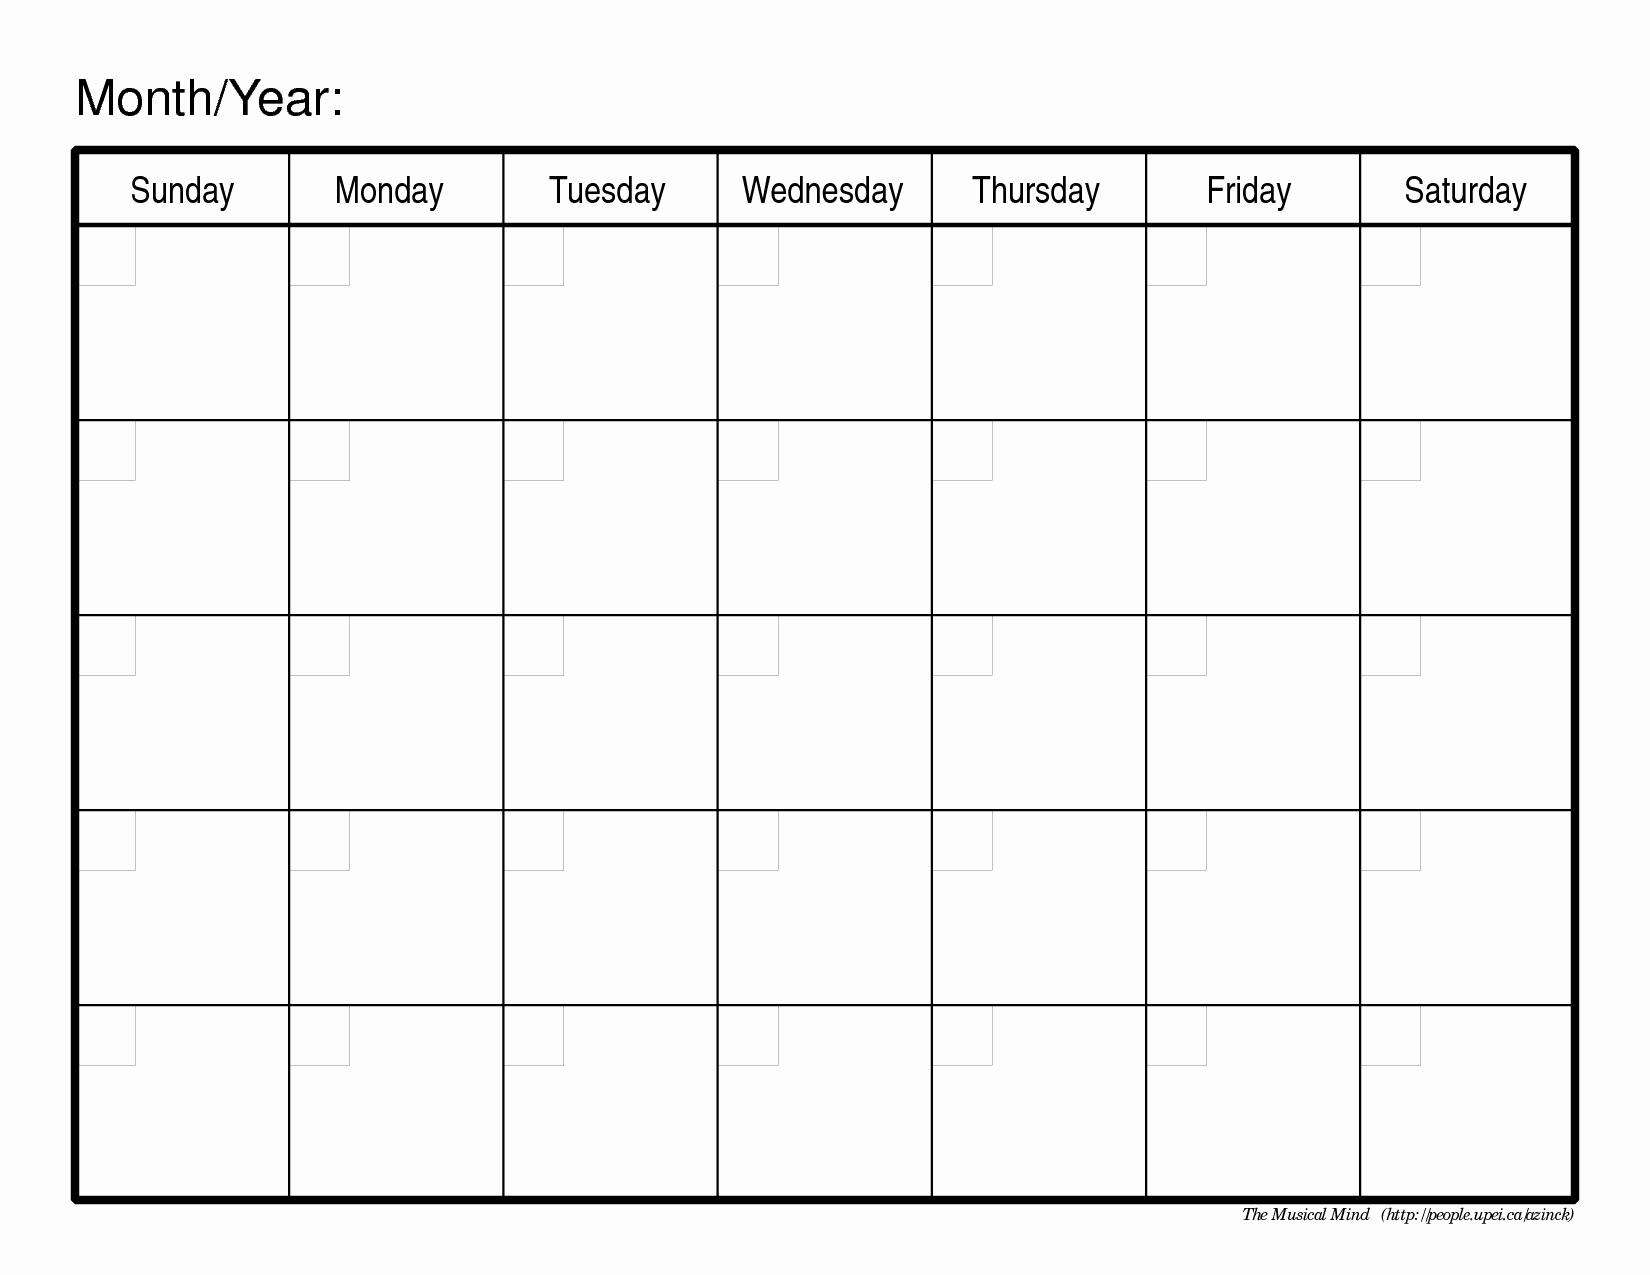 Monthly Calendar to Print – 2017 Printable Calendar